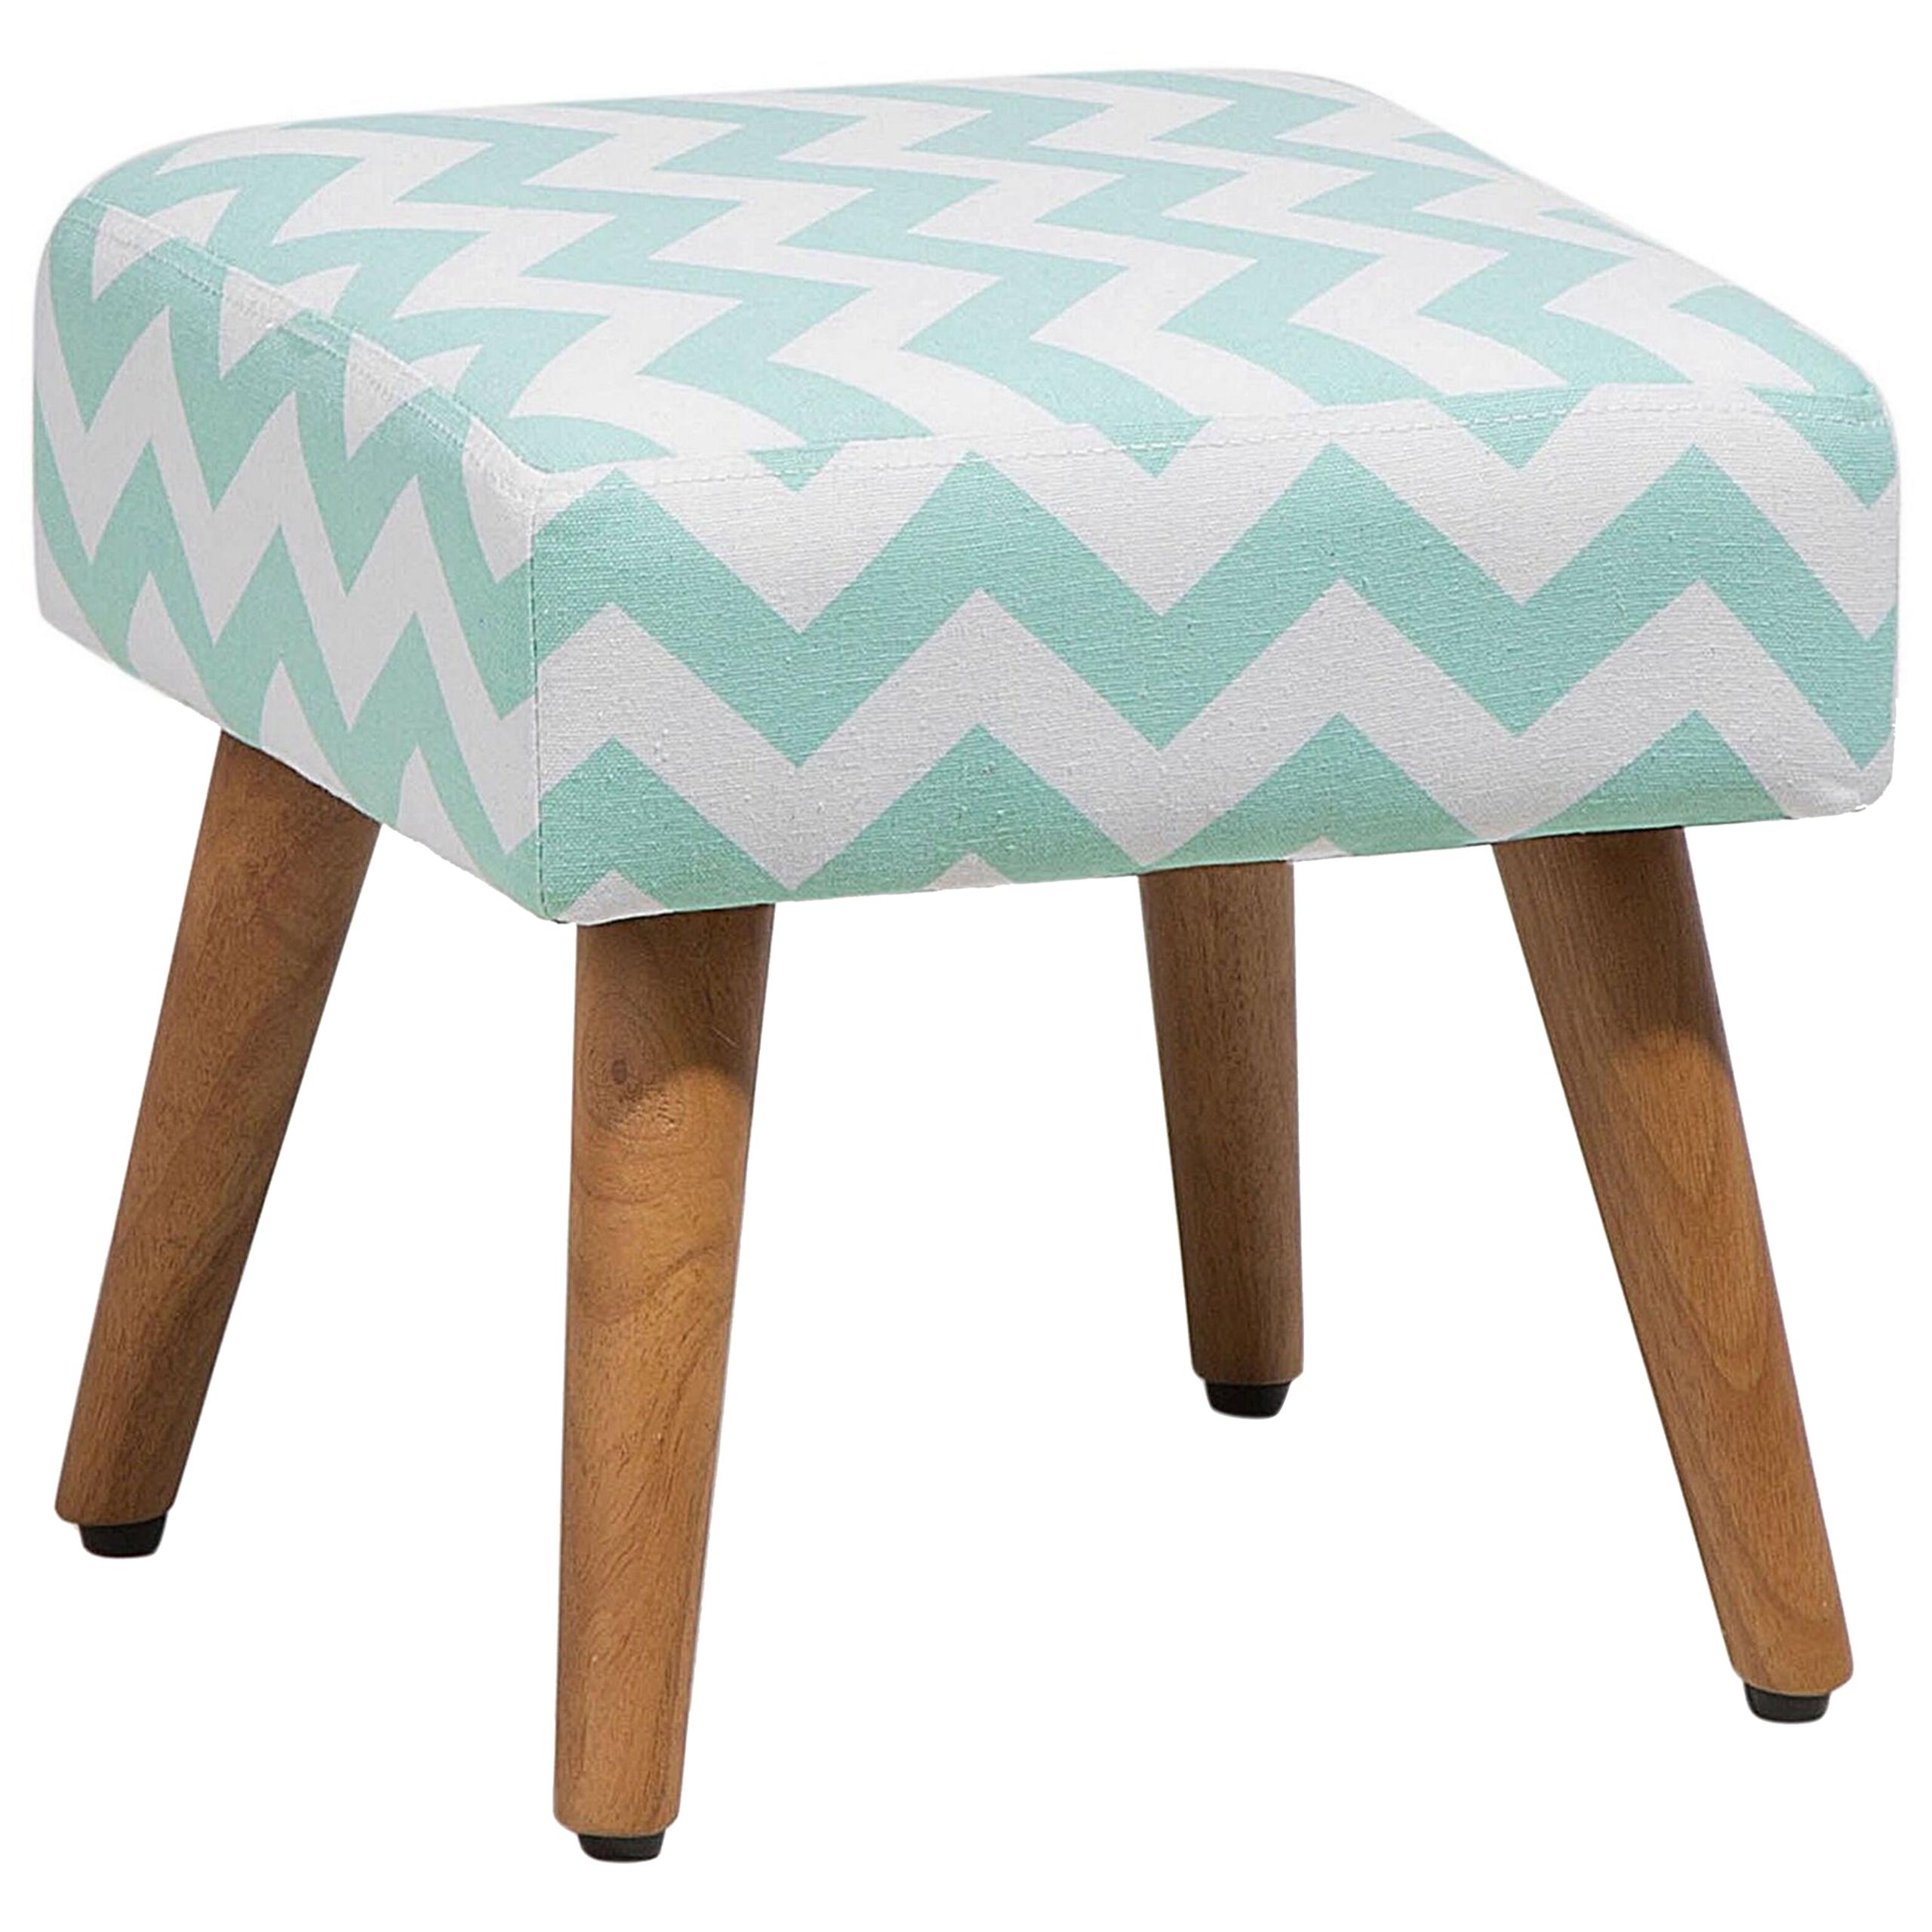 Beliani Footstool Green Fabric Upholstery Square Seat Chevron Pattern Wooden Legs